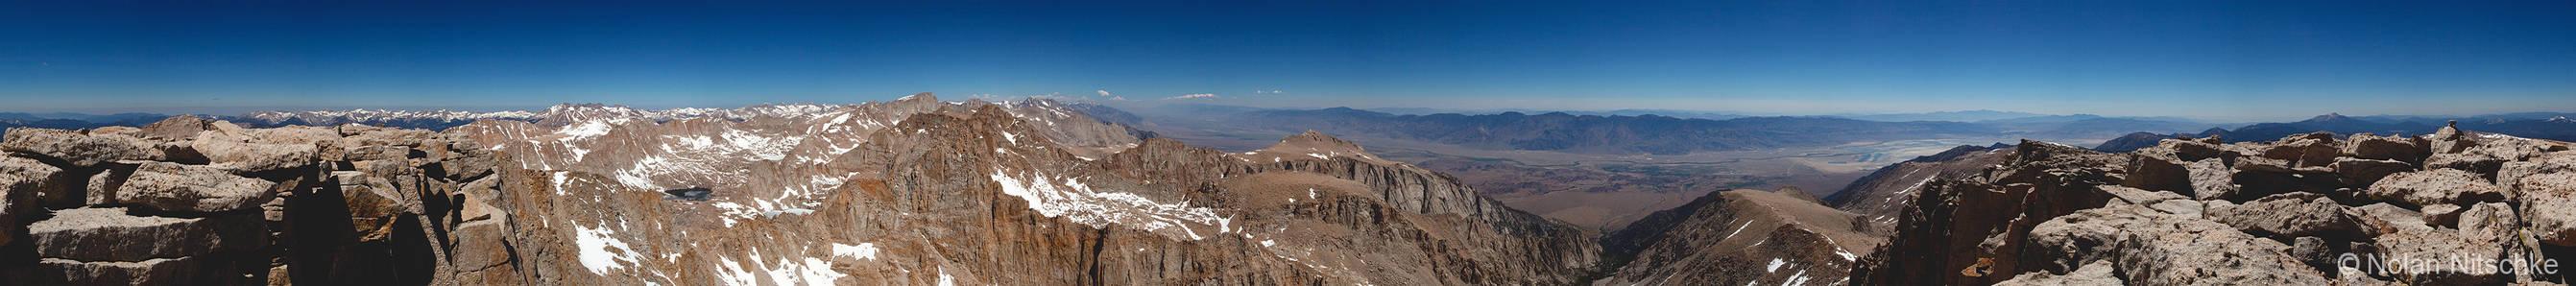 Mt. Langley Summit 360 Pano